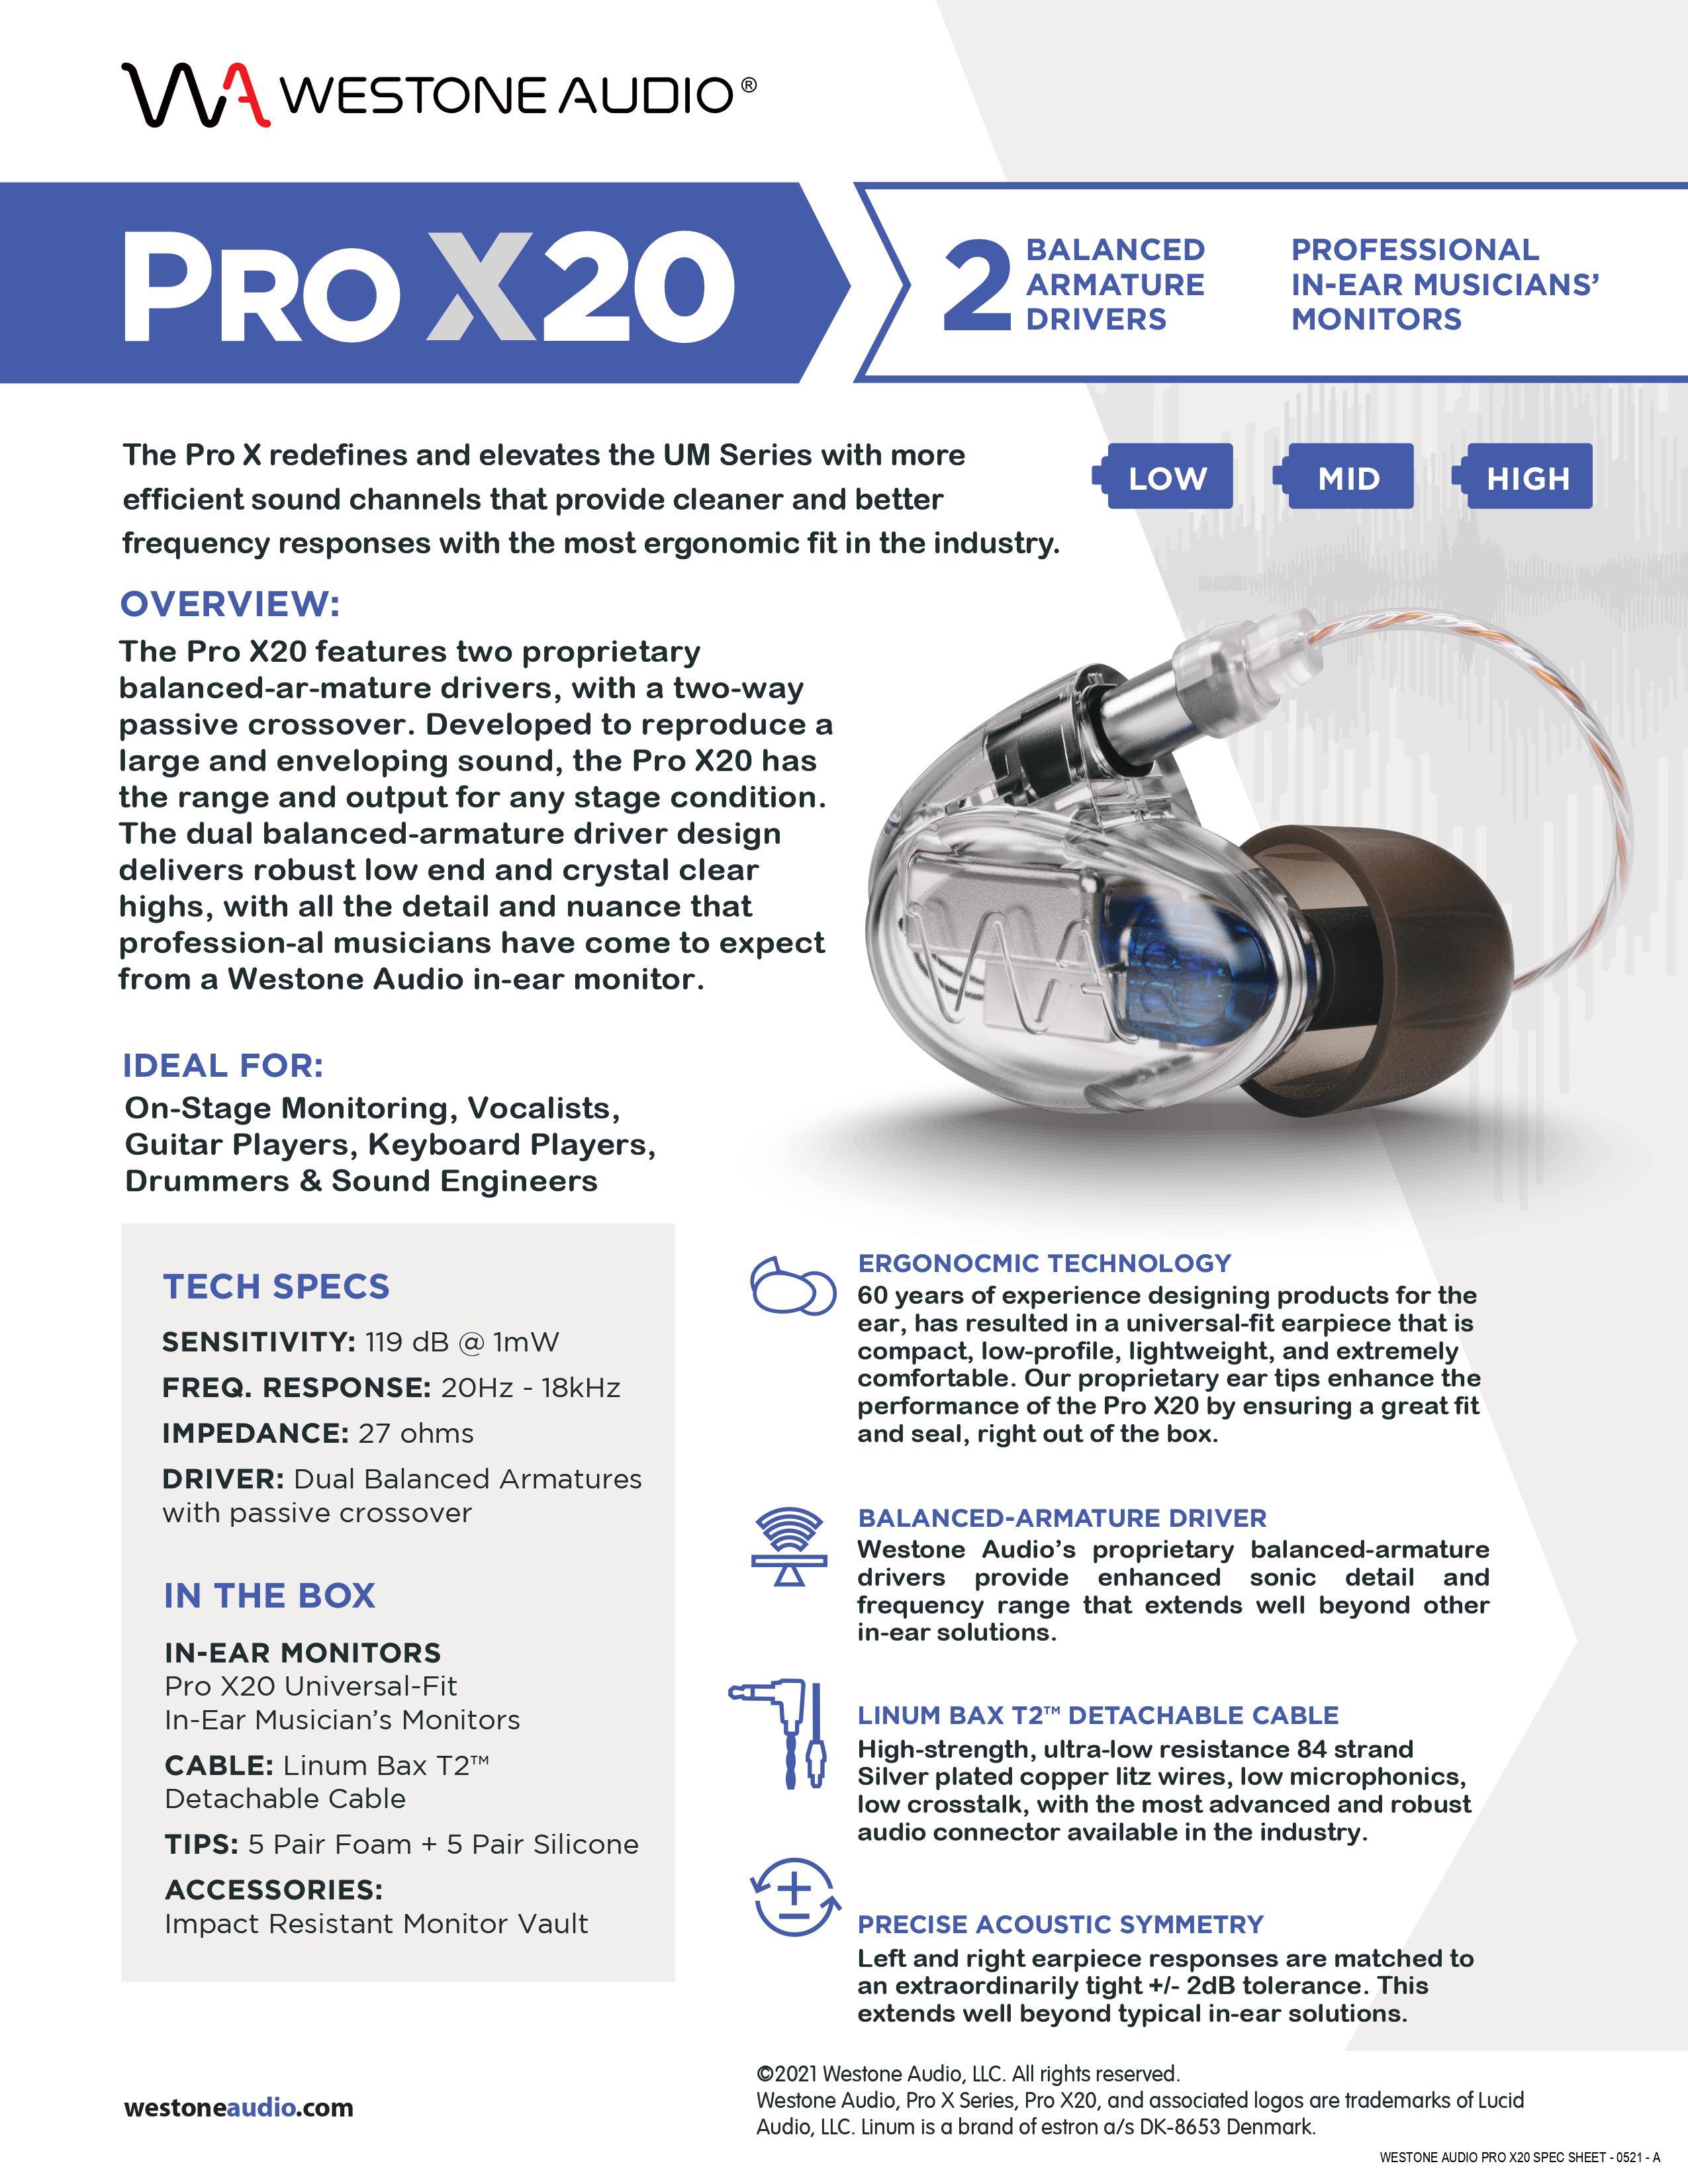 westone-pro-x20-data-sheet.jpg